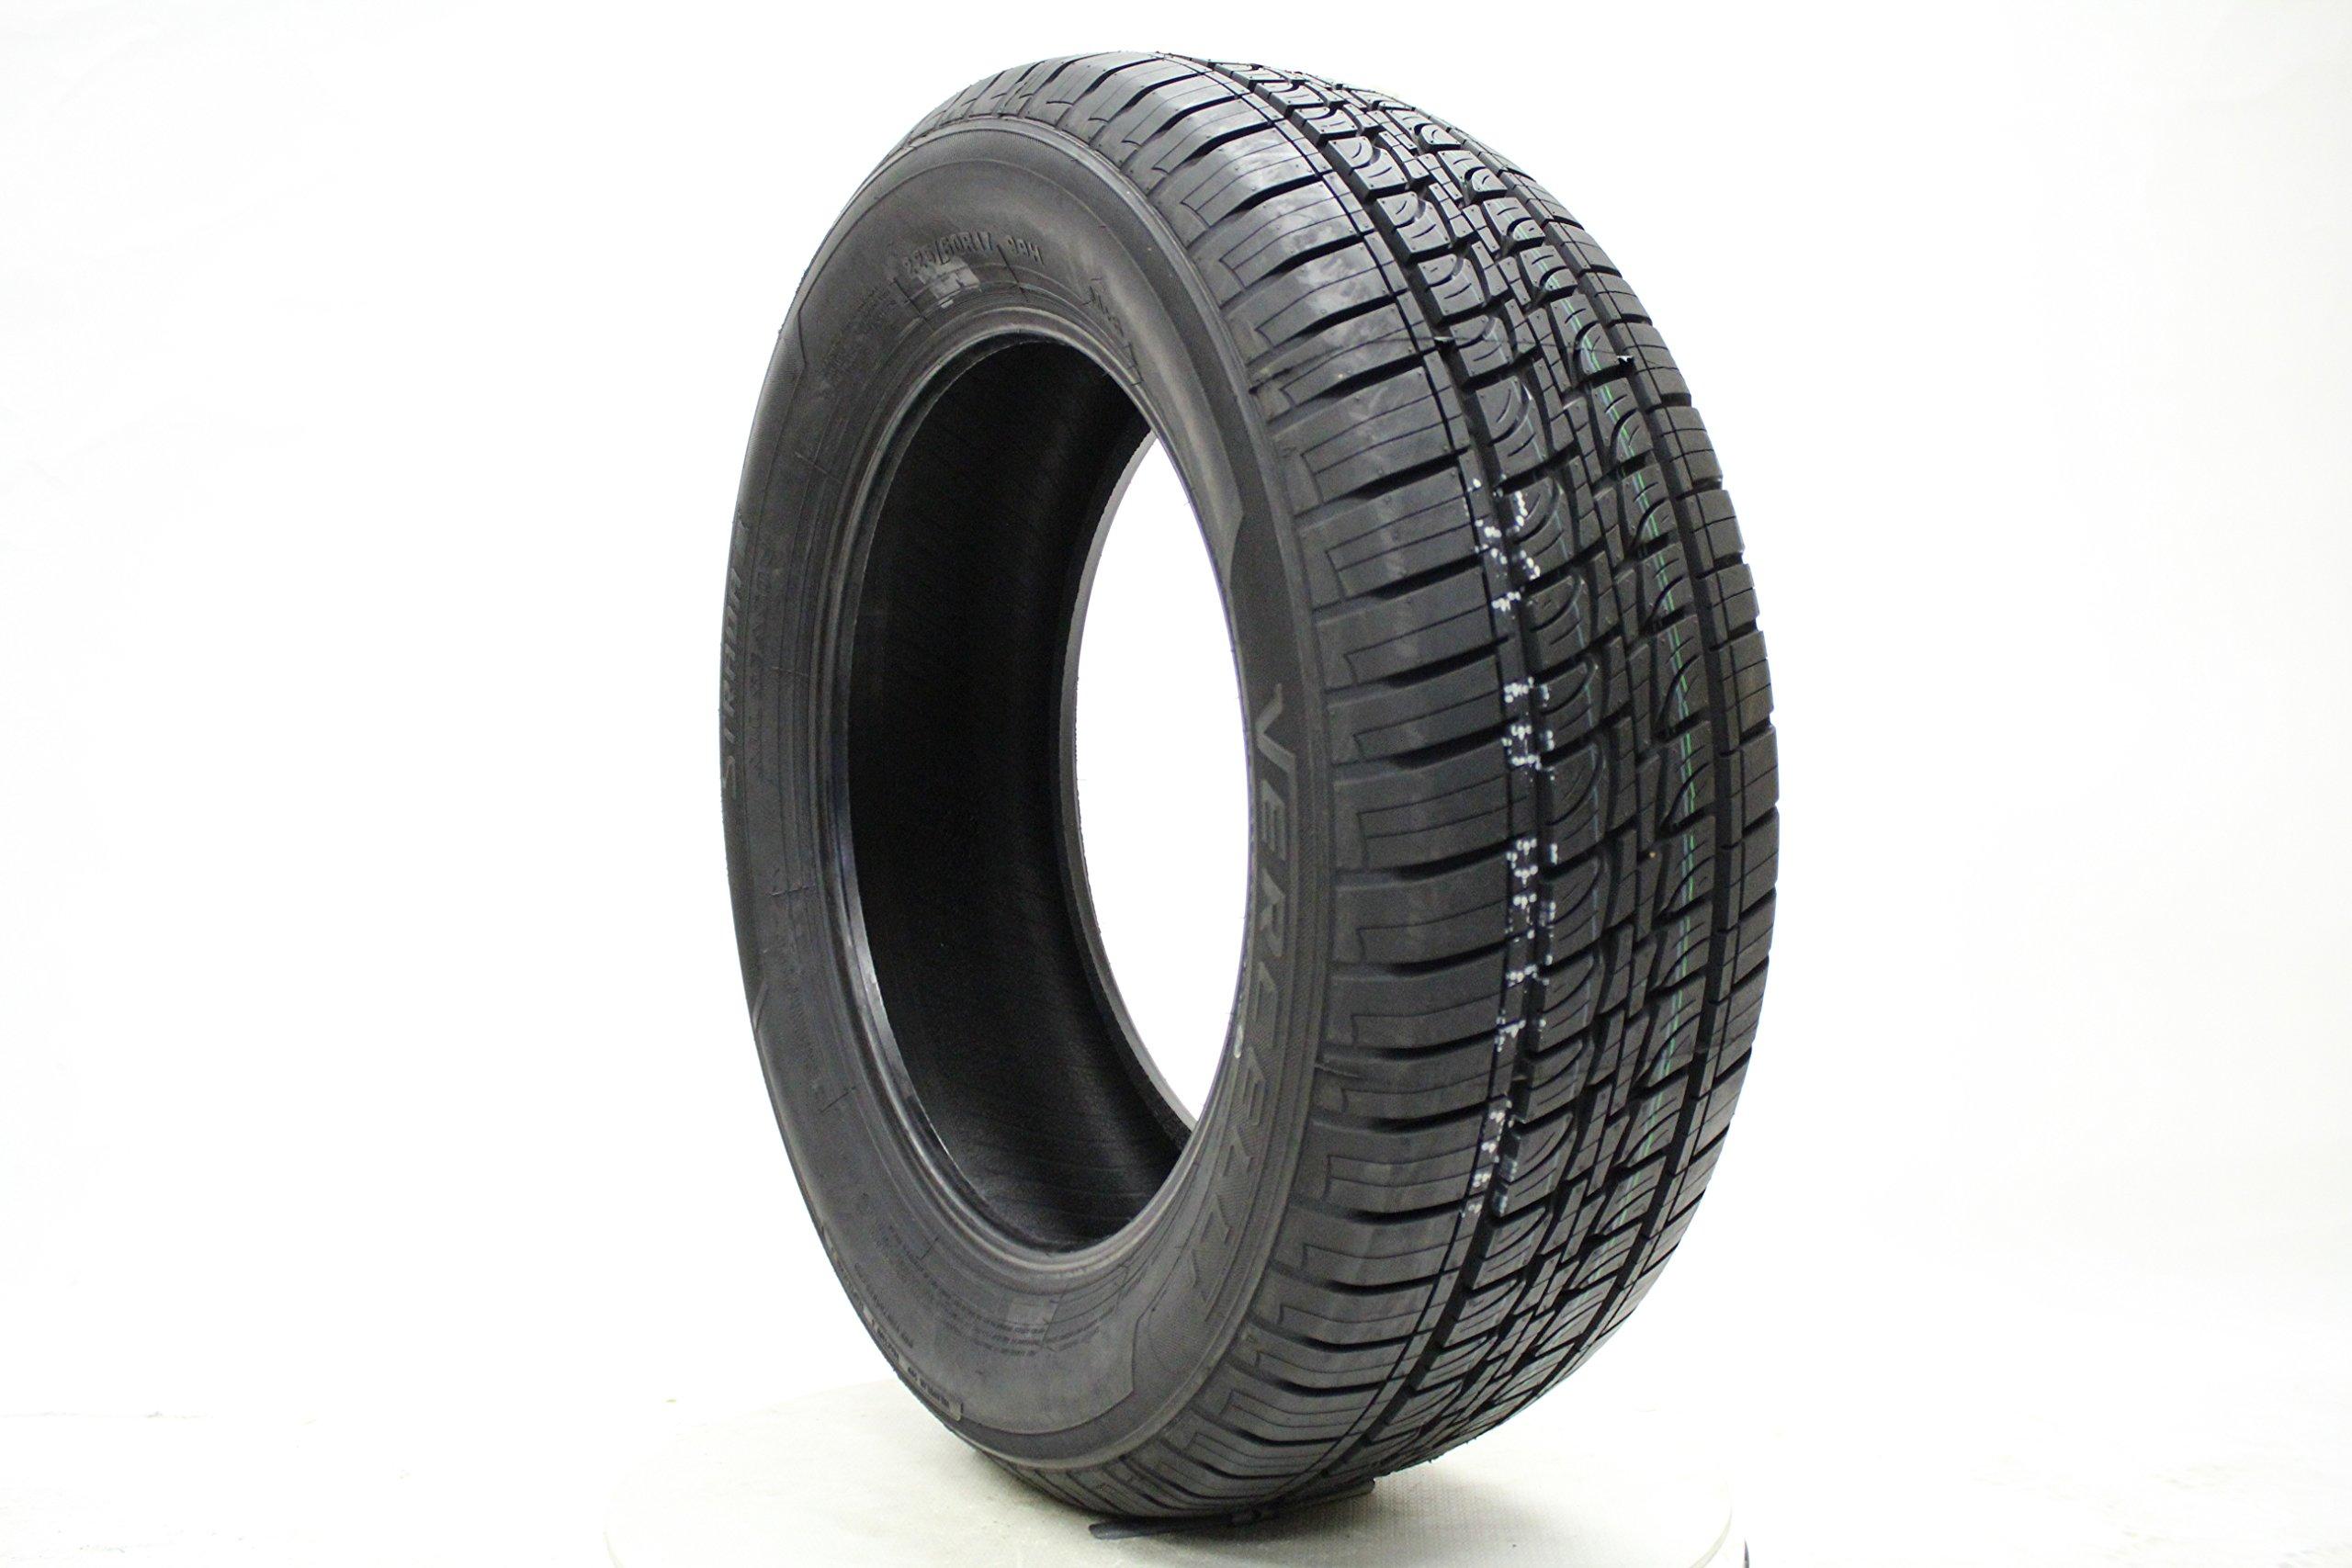 Vercelli Strada III All-Season Radial Tire - 235/55R18 100H by Vercelli (Image #1)